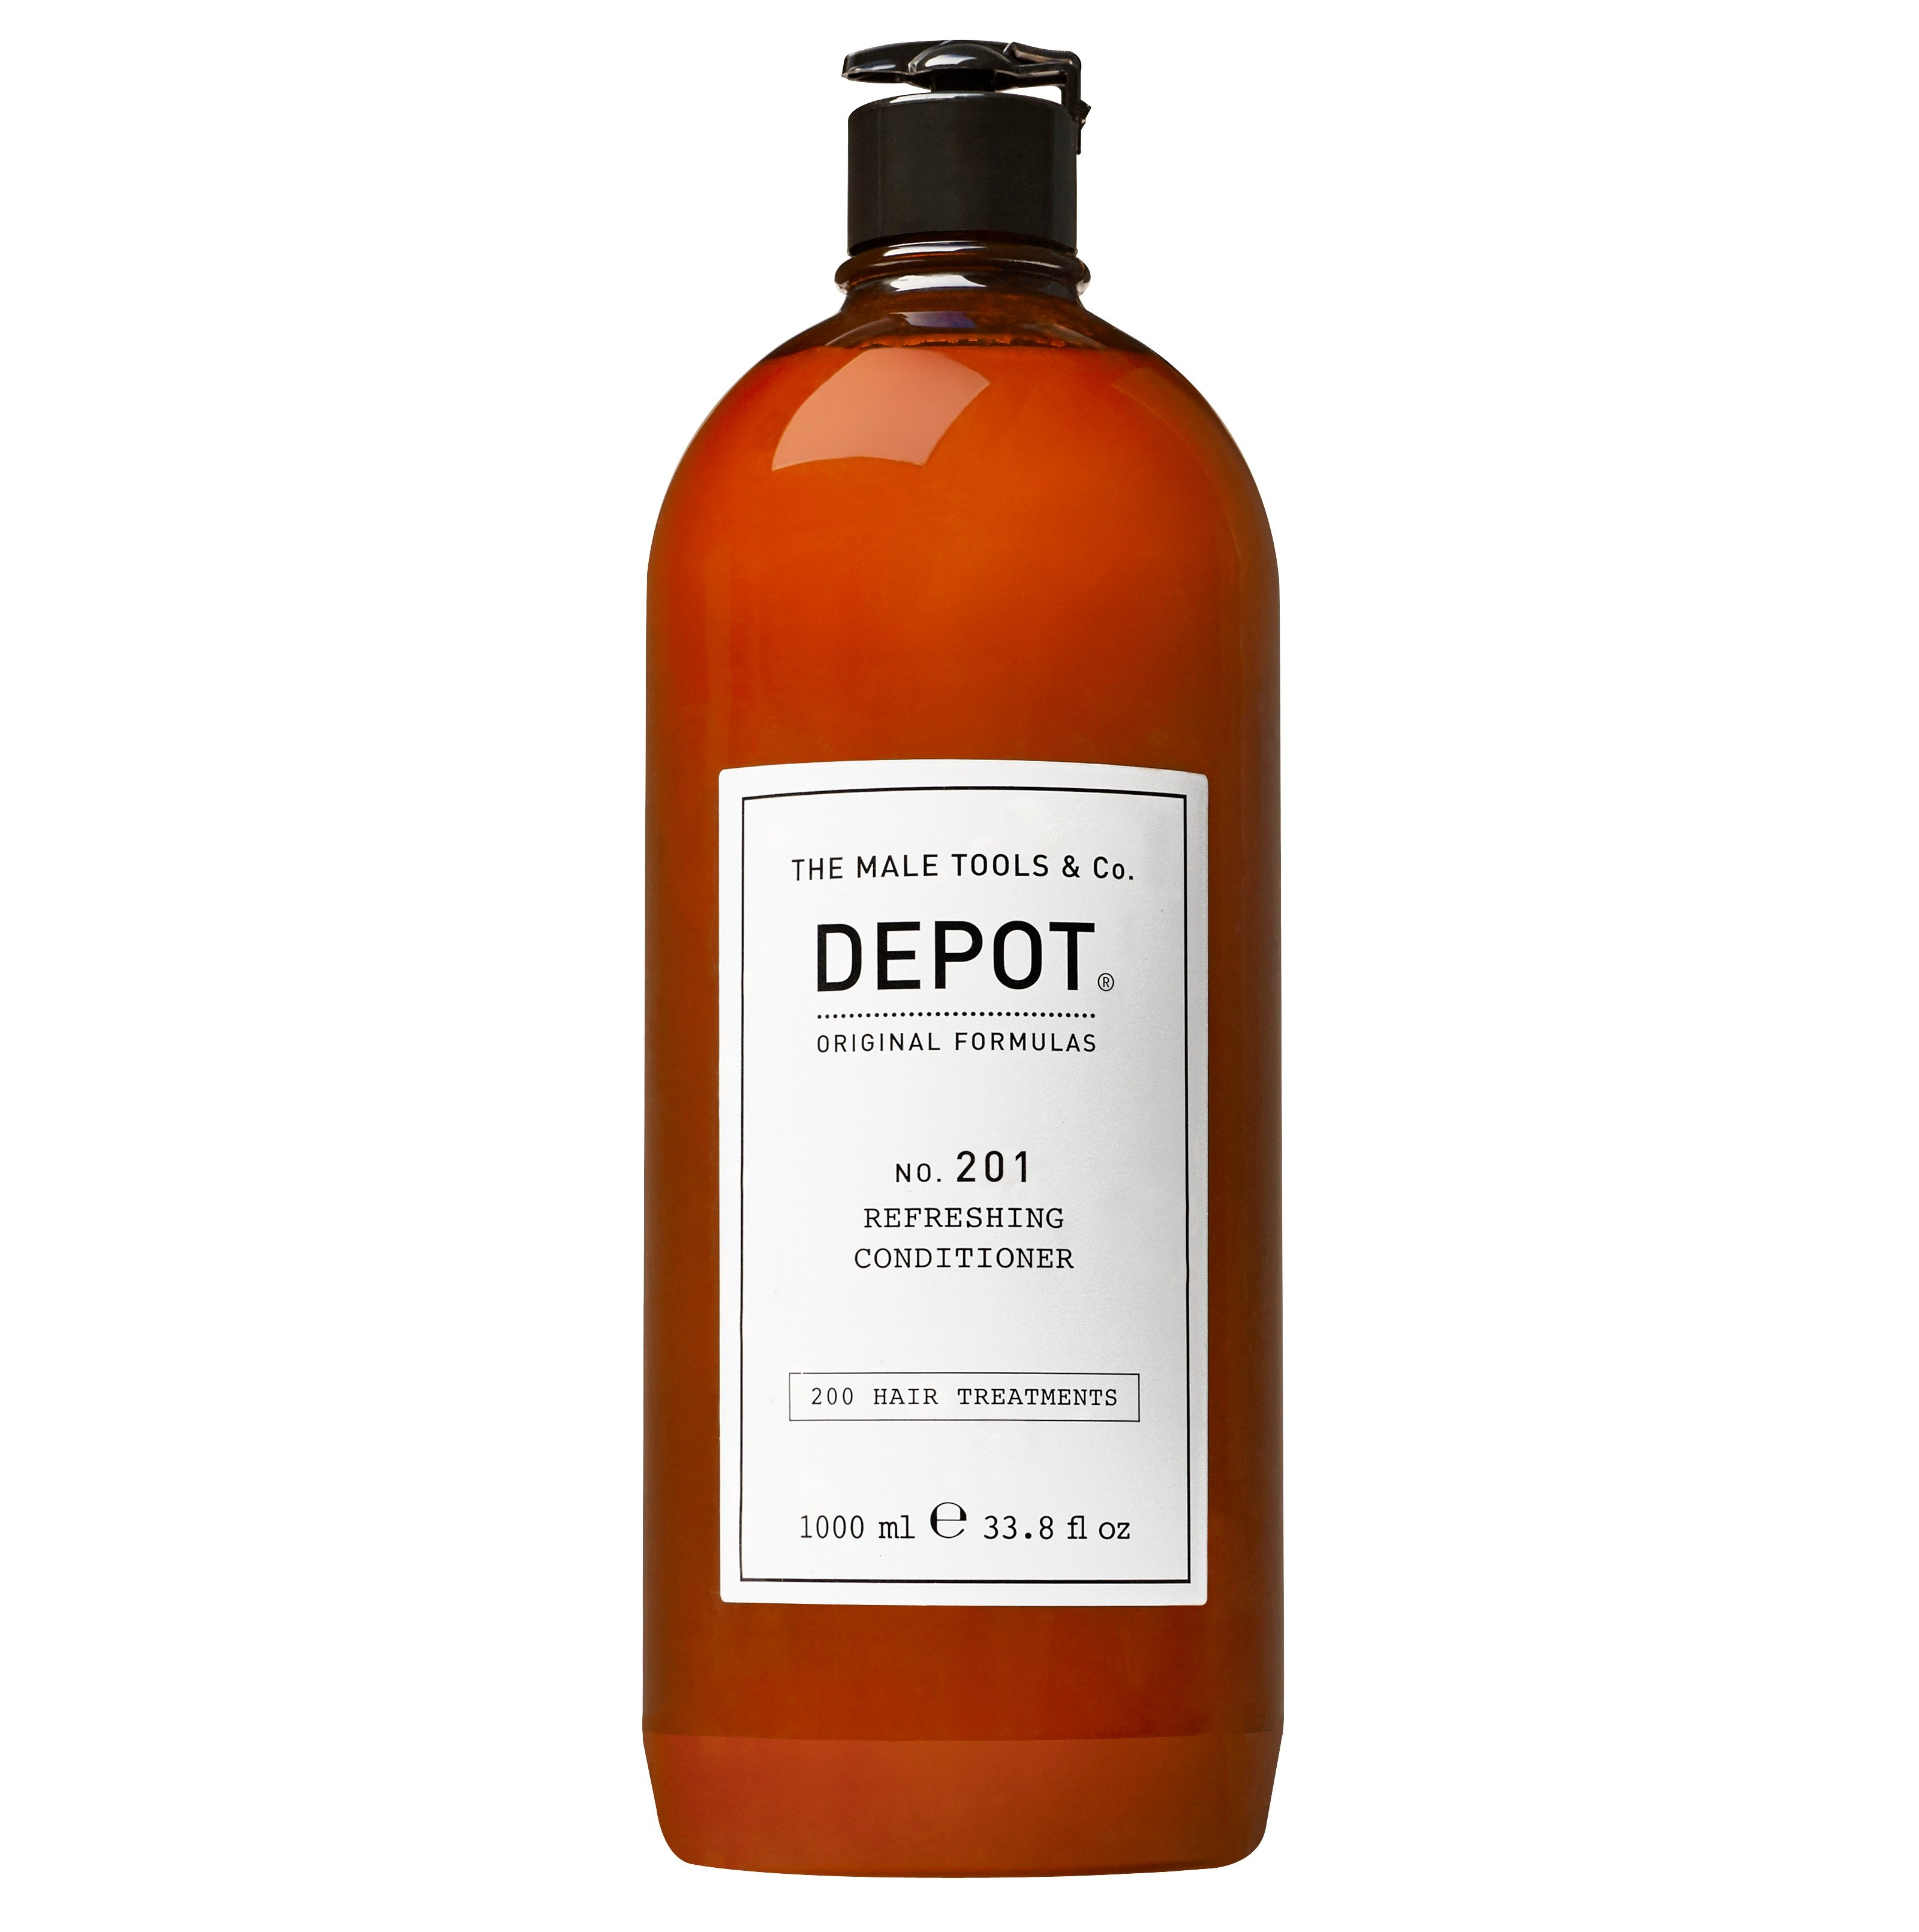 Depot - No. 201 Refreshing Conditioner 1000 ml